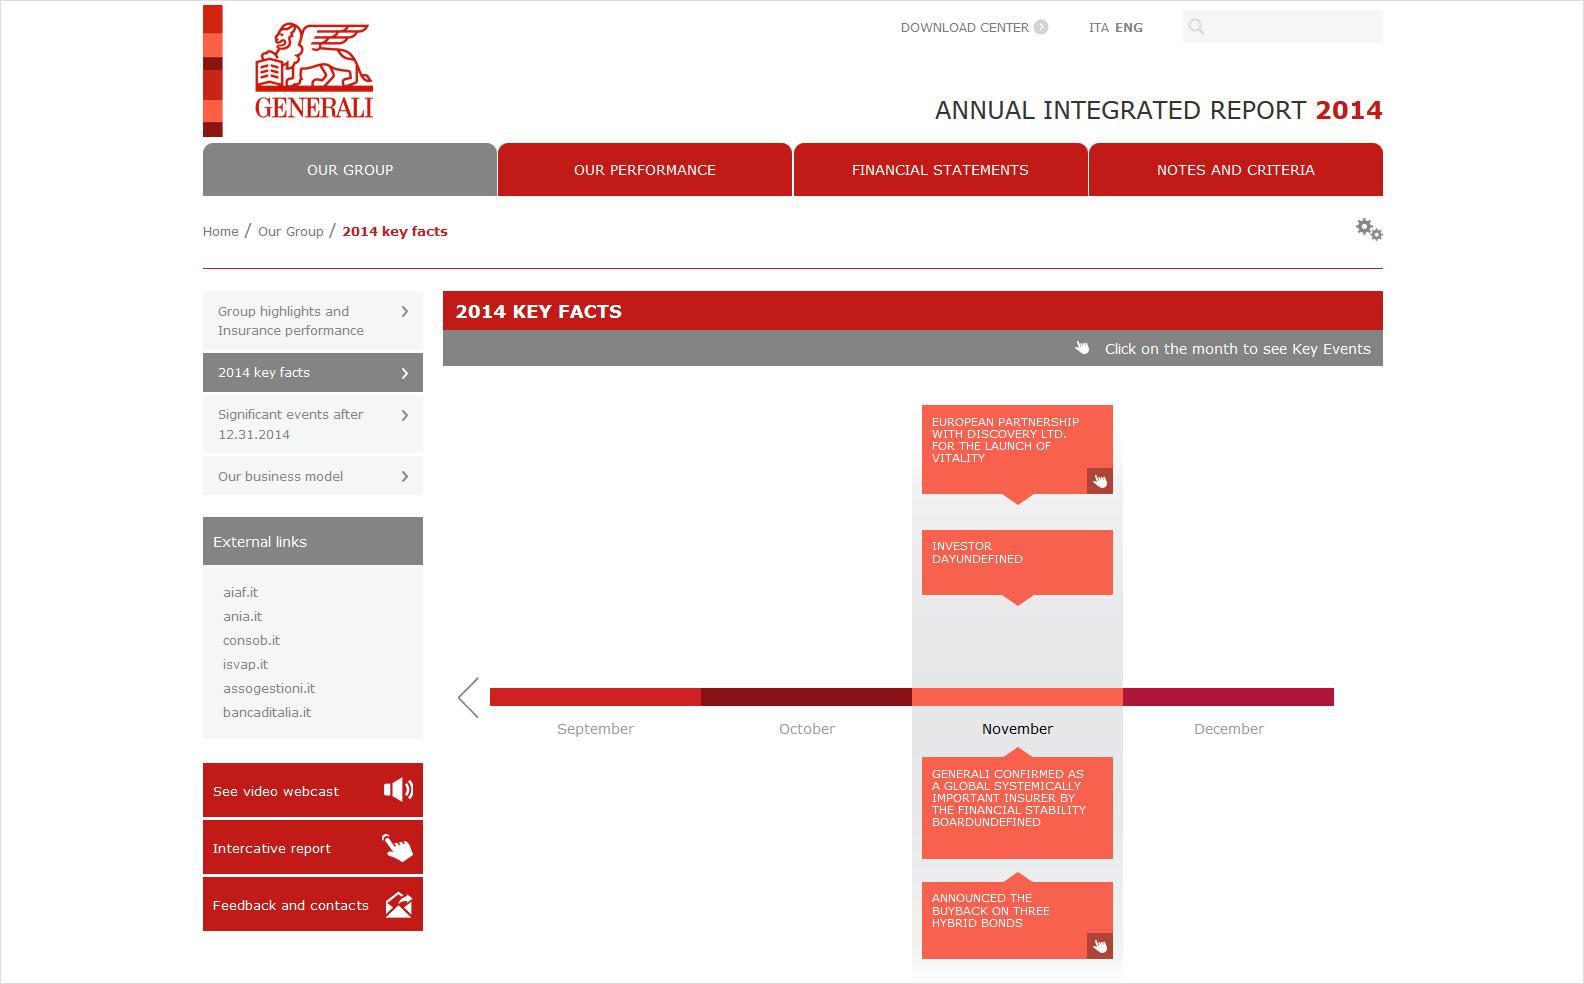 Generali Annual Integrated Report 2014